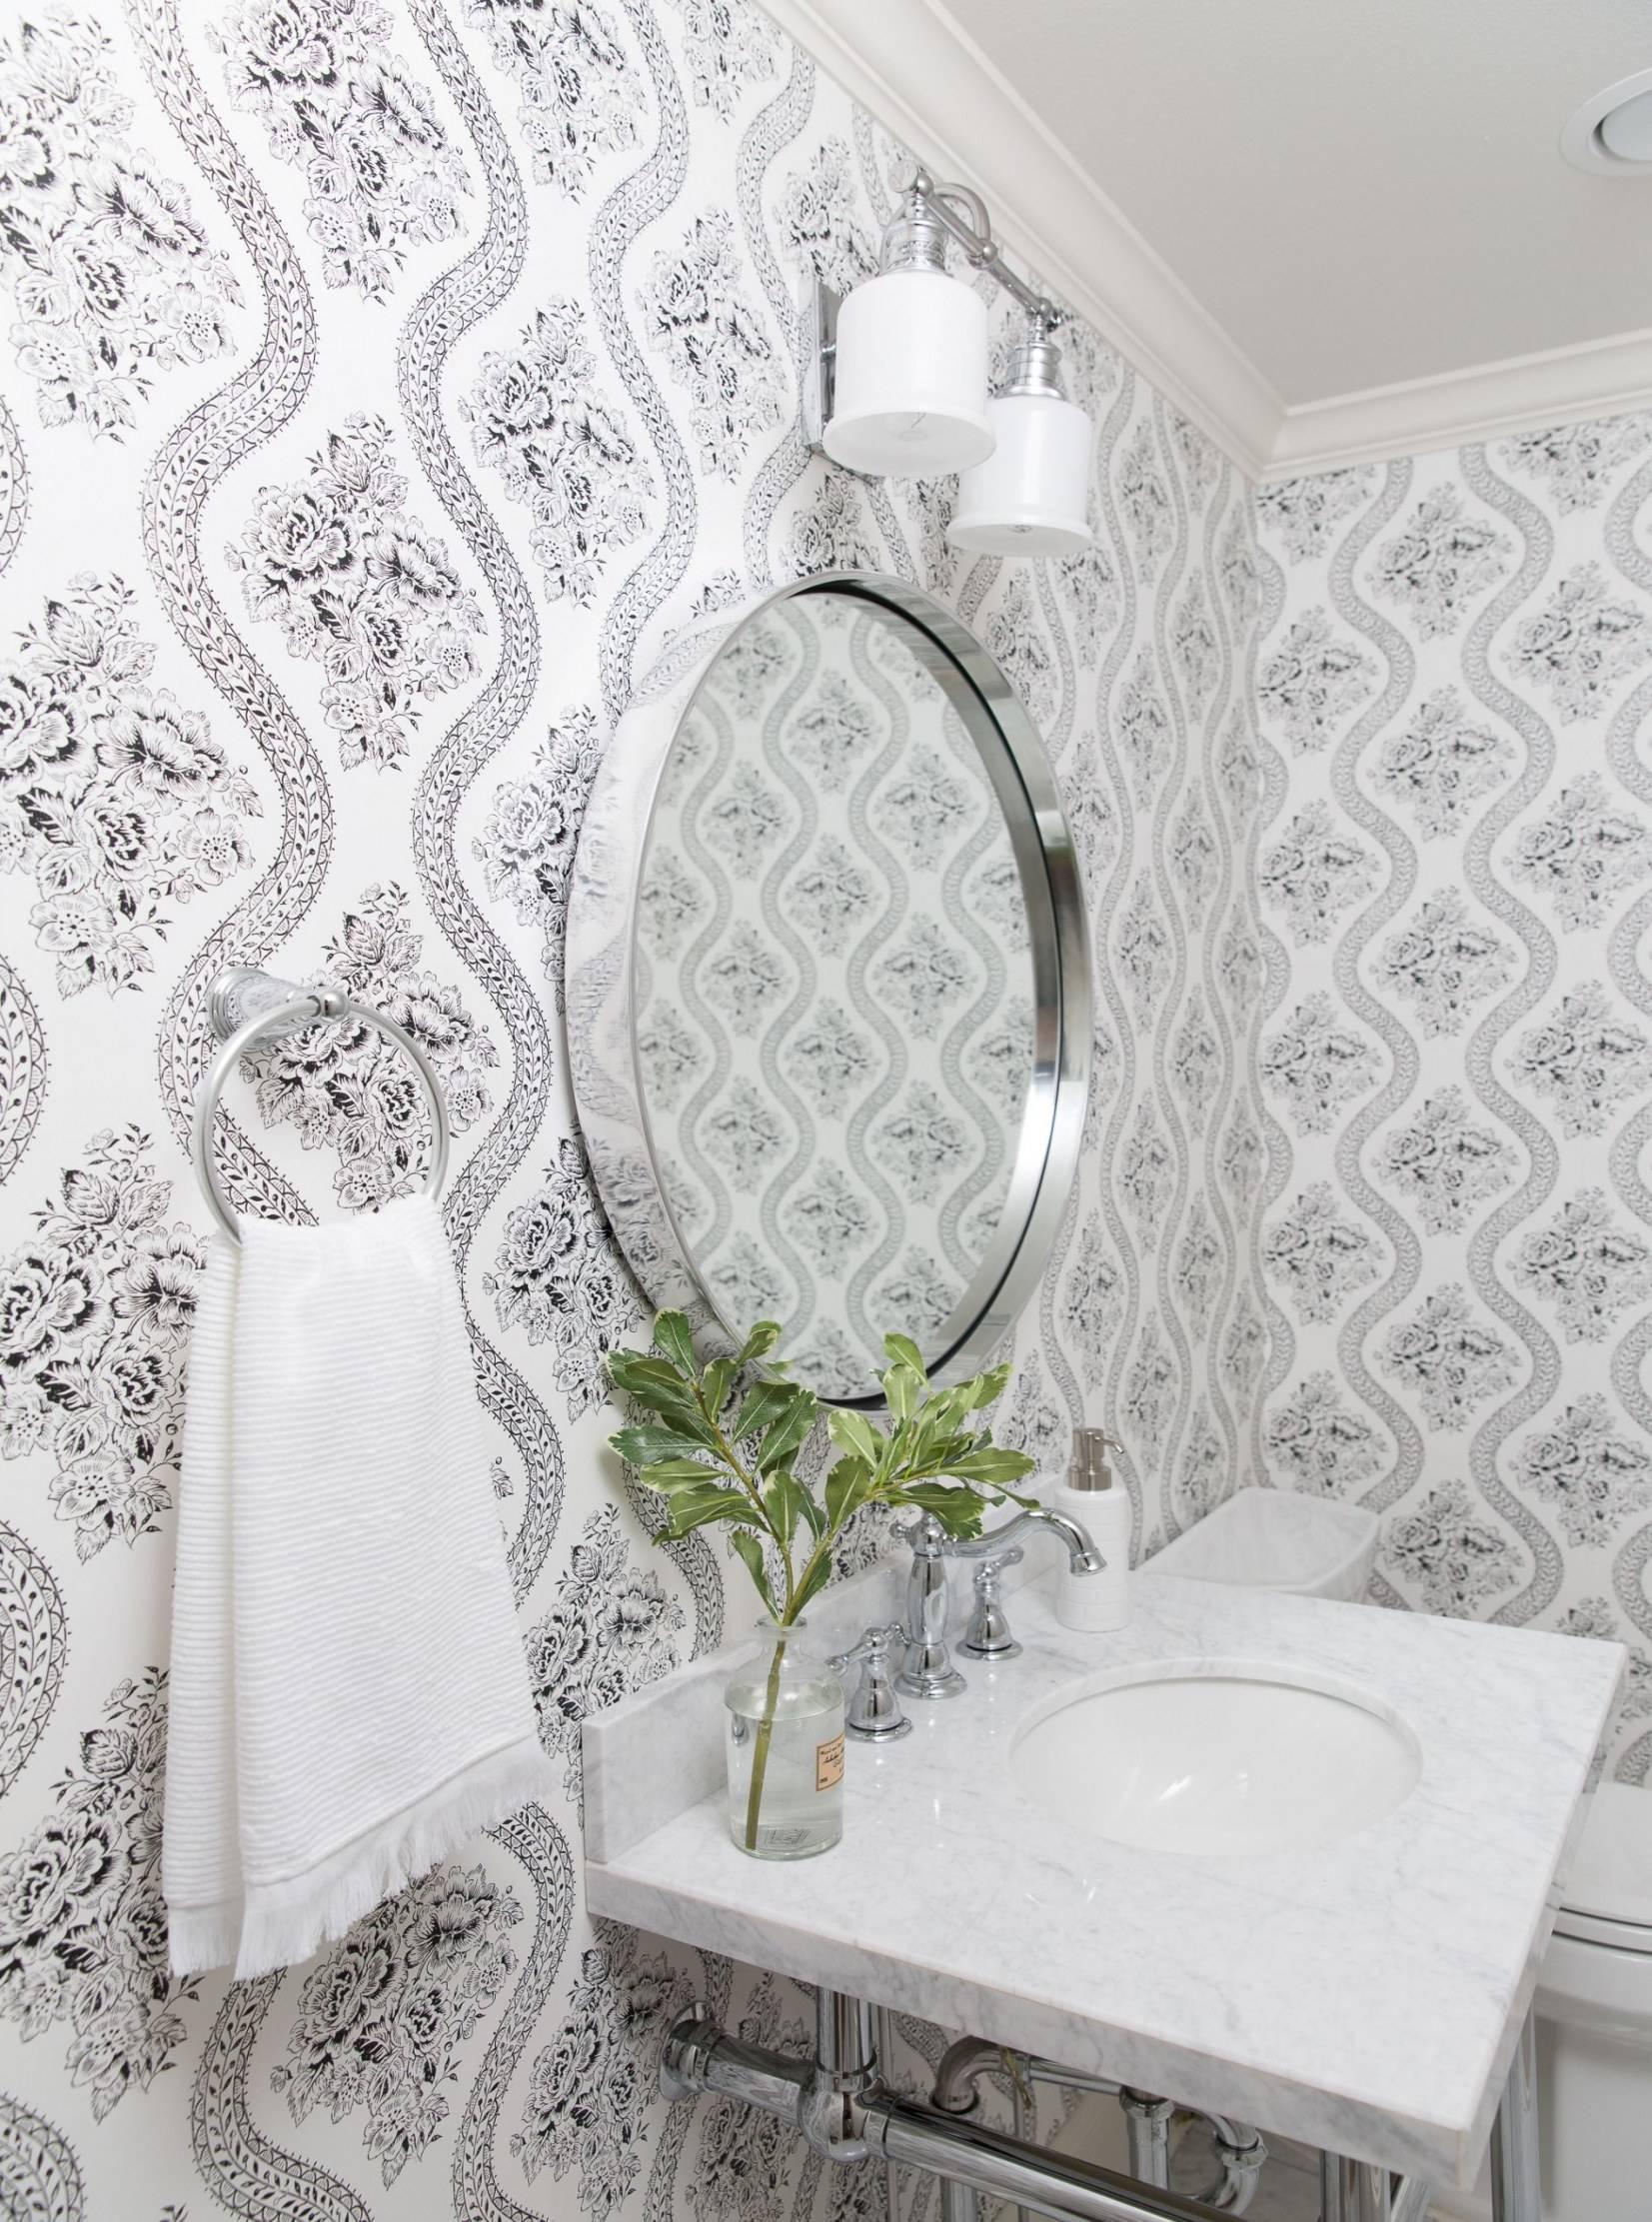 wallpaper accent wall wallpaper design for home 2019 walldesign of wallpaper accent wall